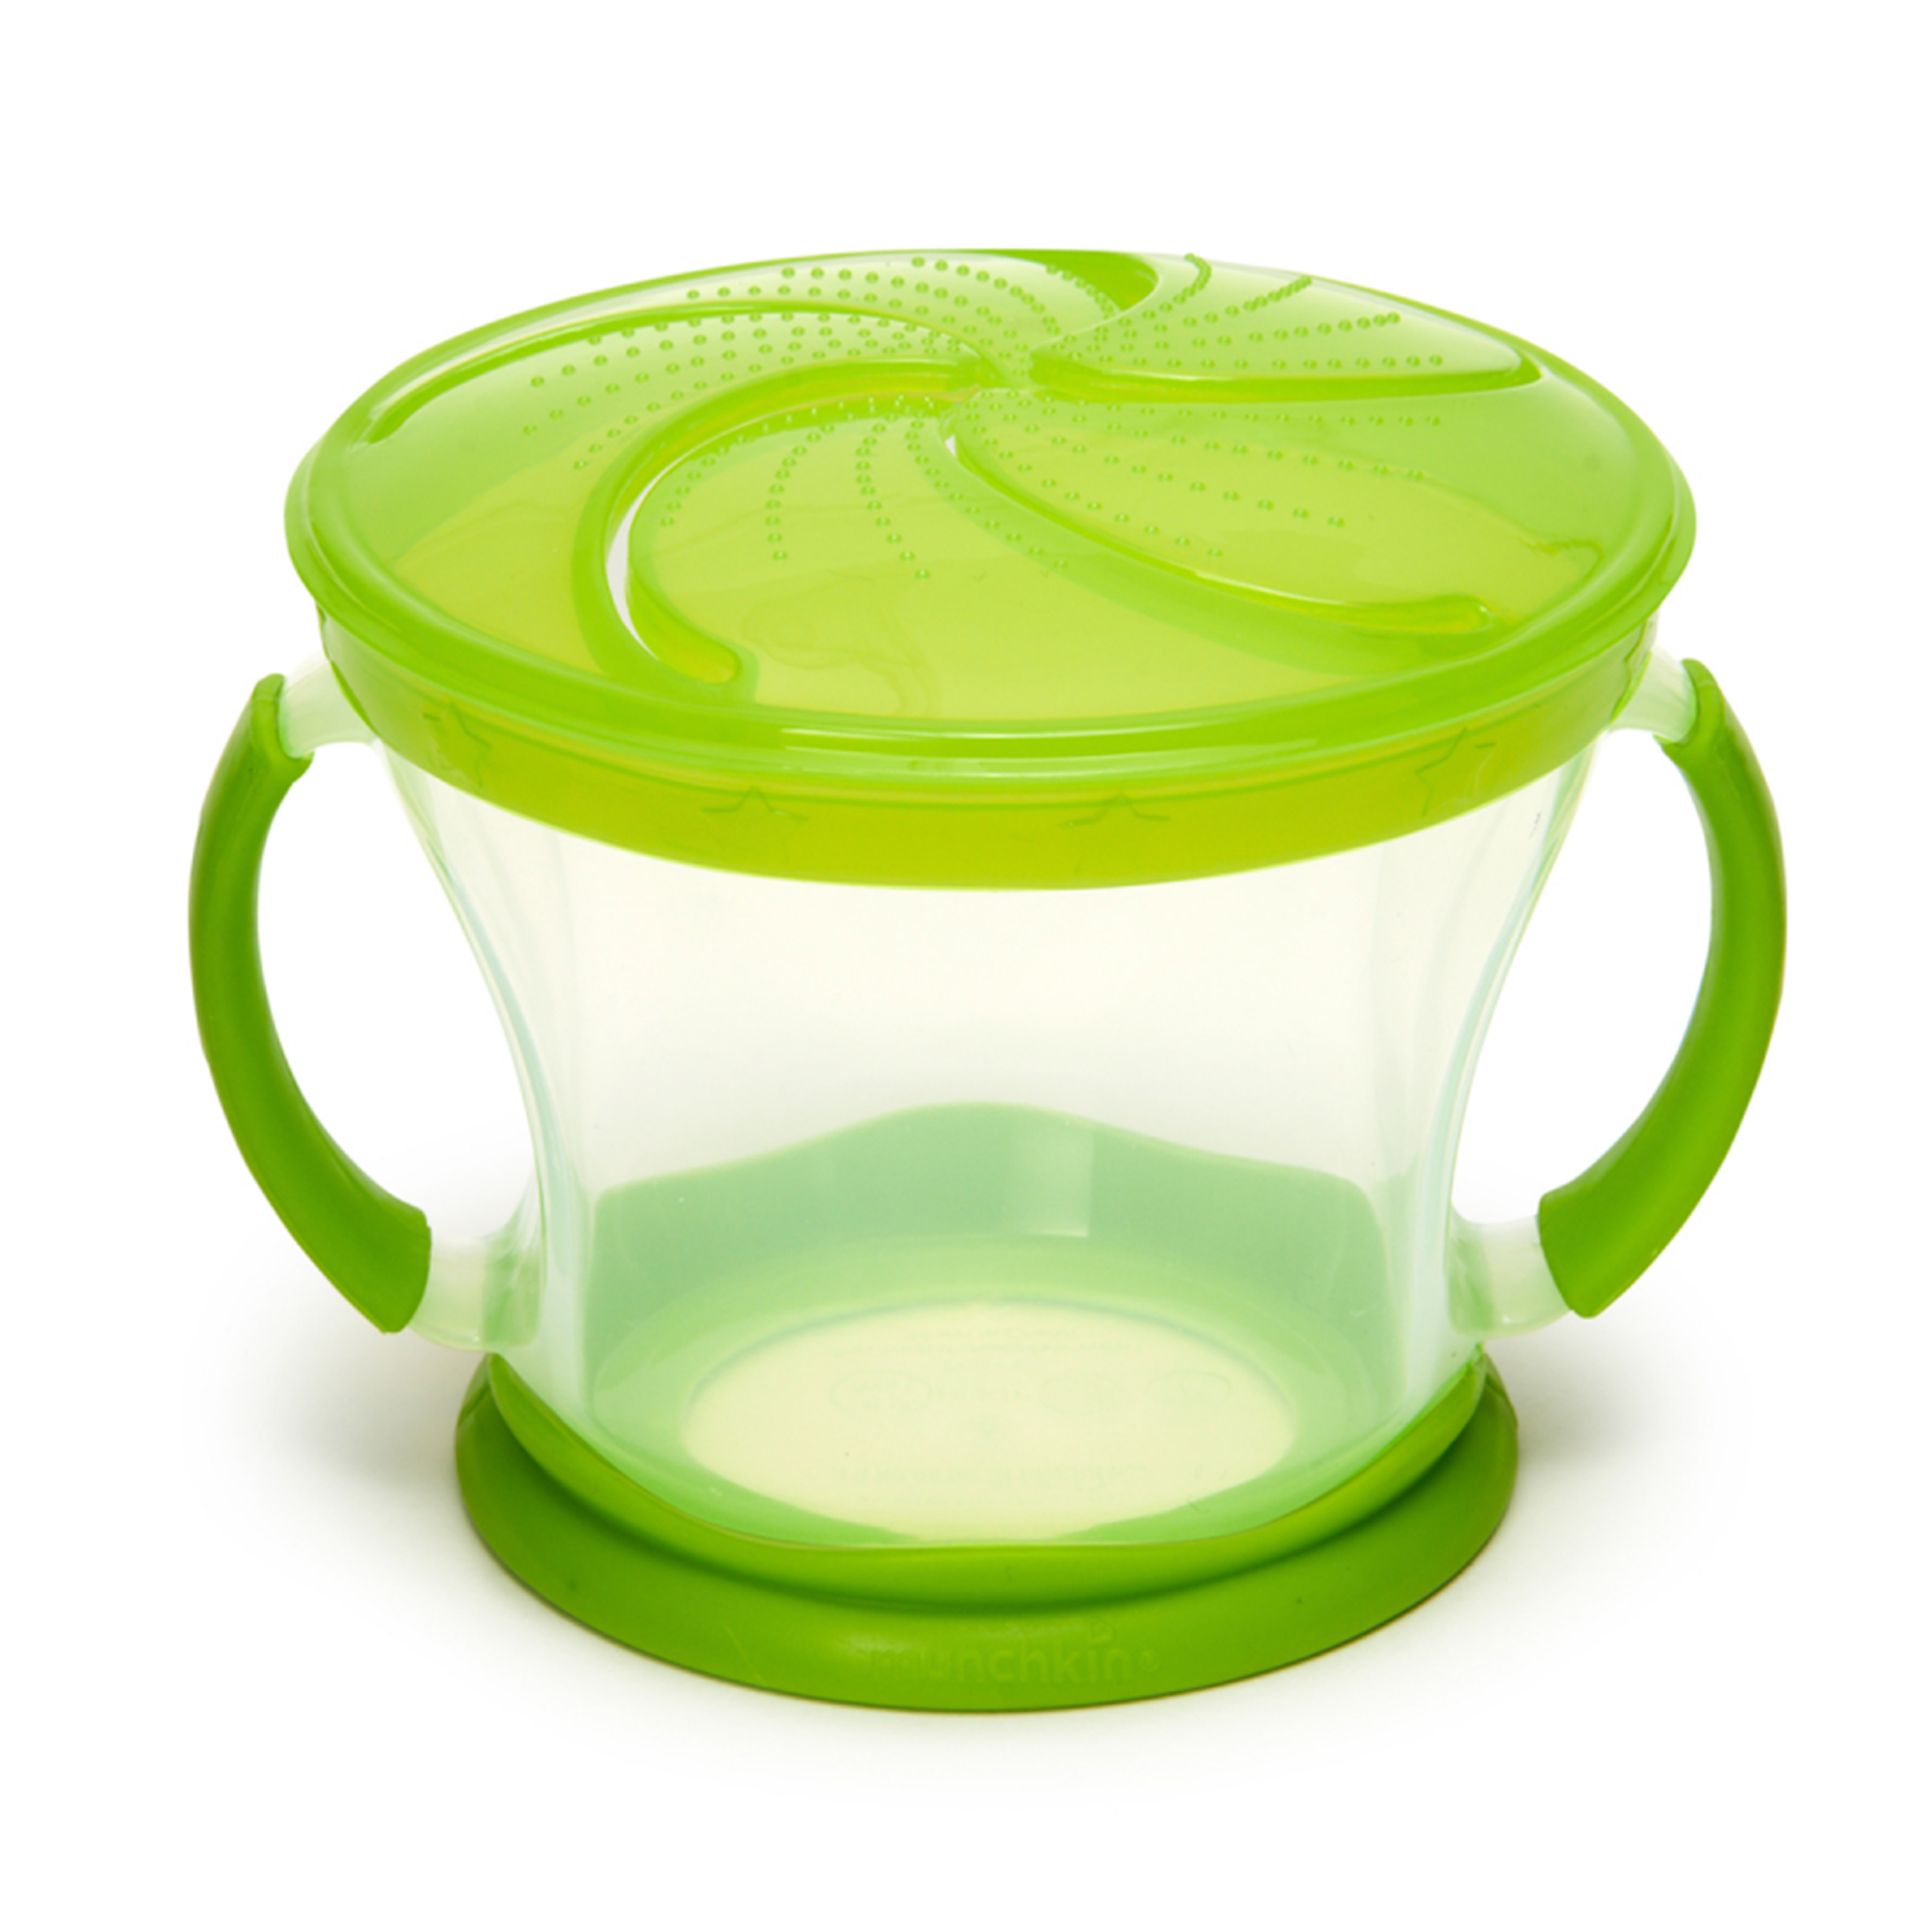 Контейнер Munchkin Поймай печенье Deluxe зеленый 12м+ контейнер munchkin поймай печенье голубой 12м